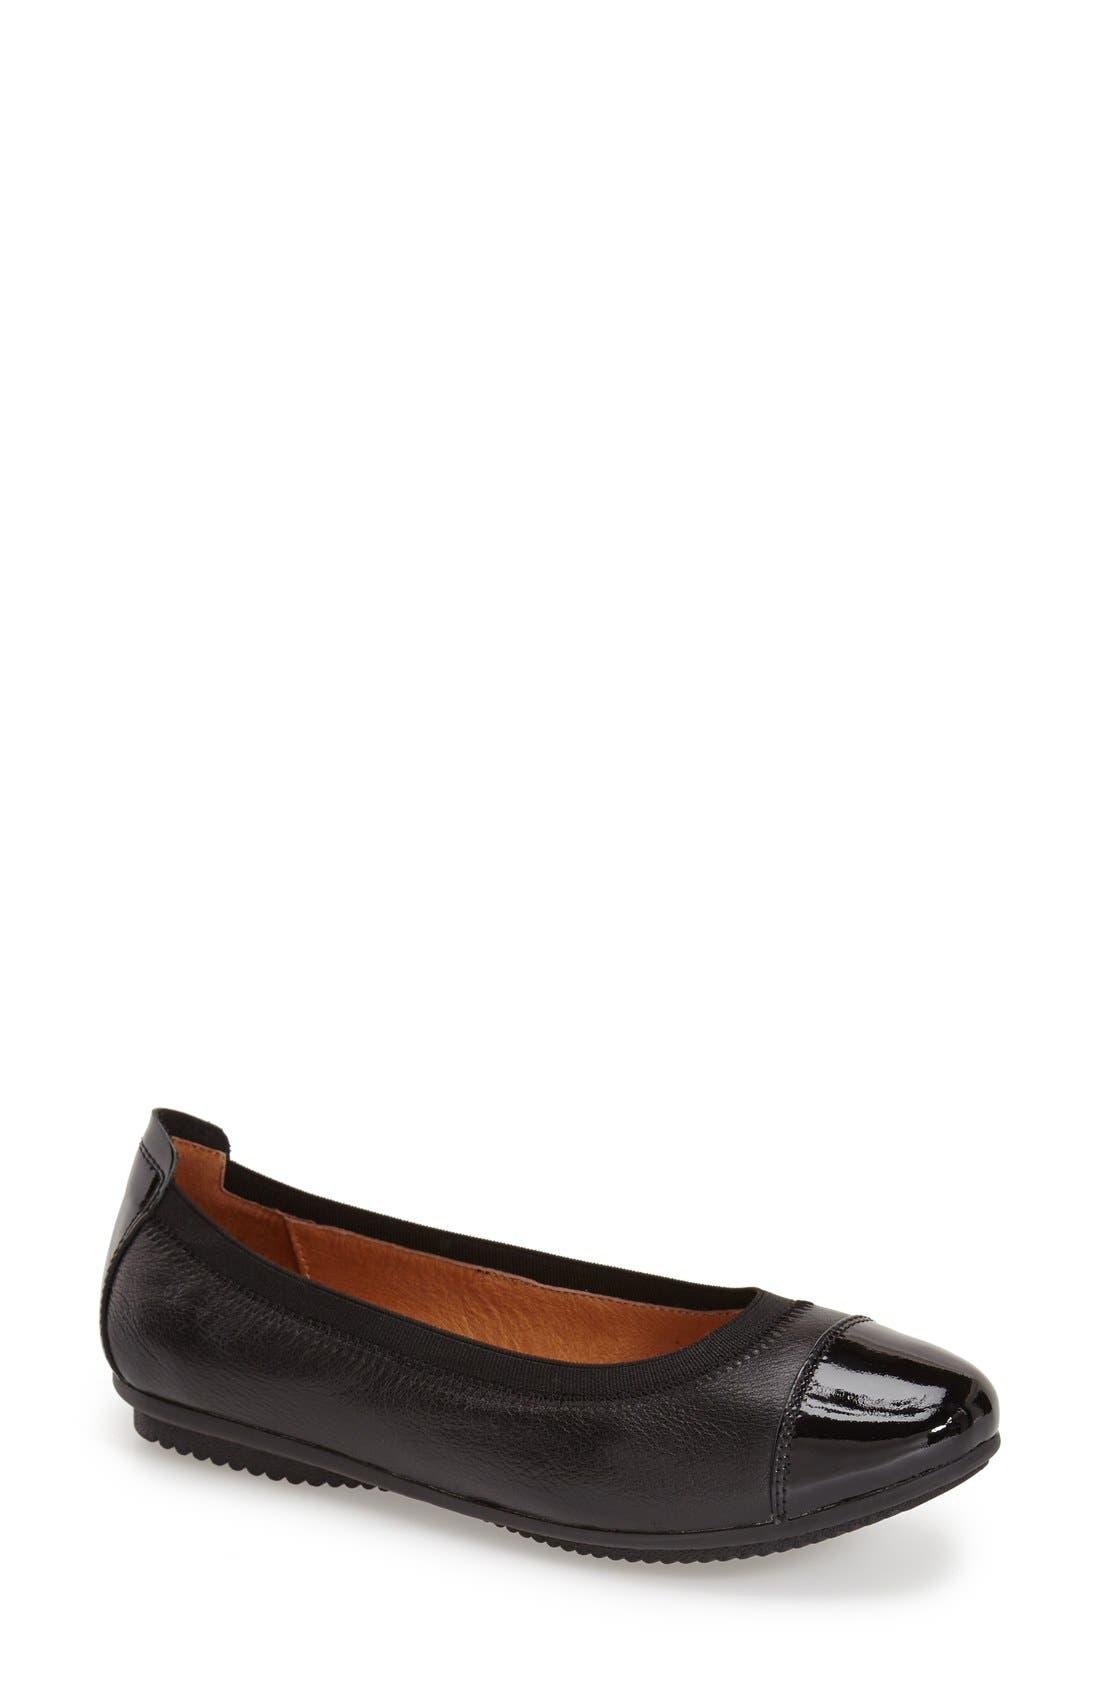 JOSEF SEIBEL Pippa 07 Flat, Main, color, BLACK PATENT